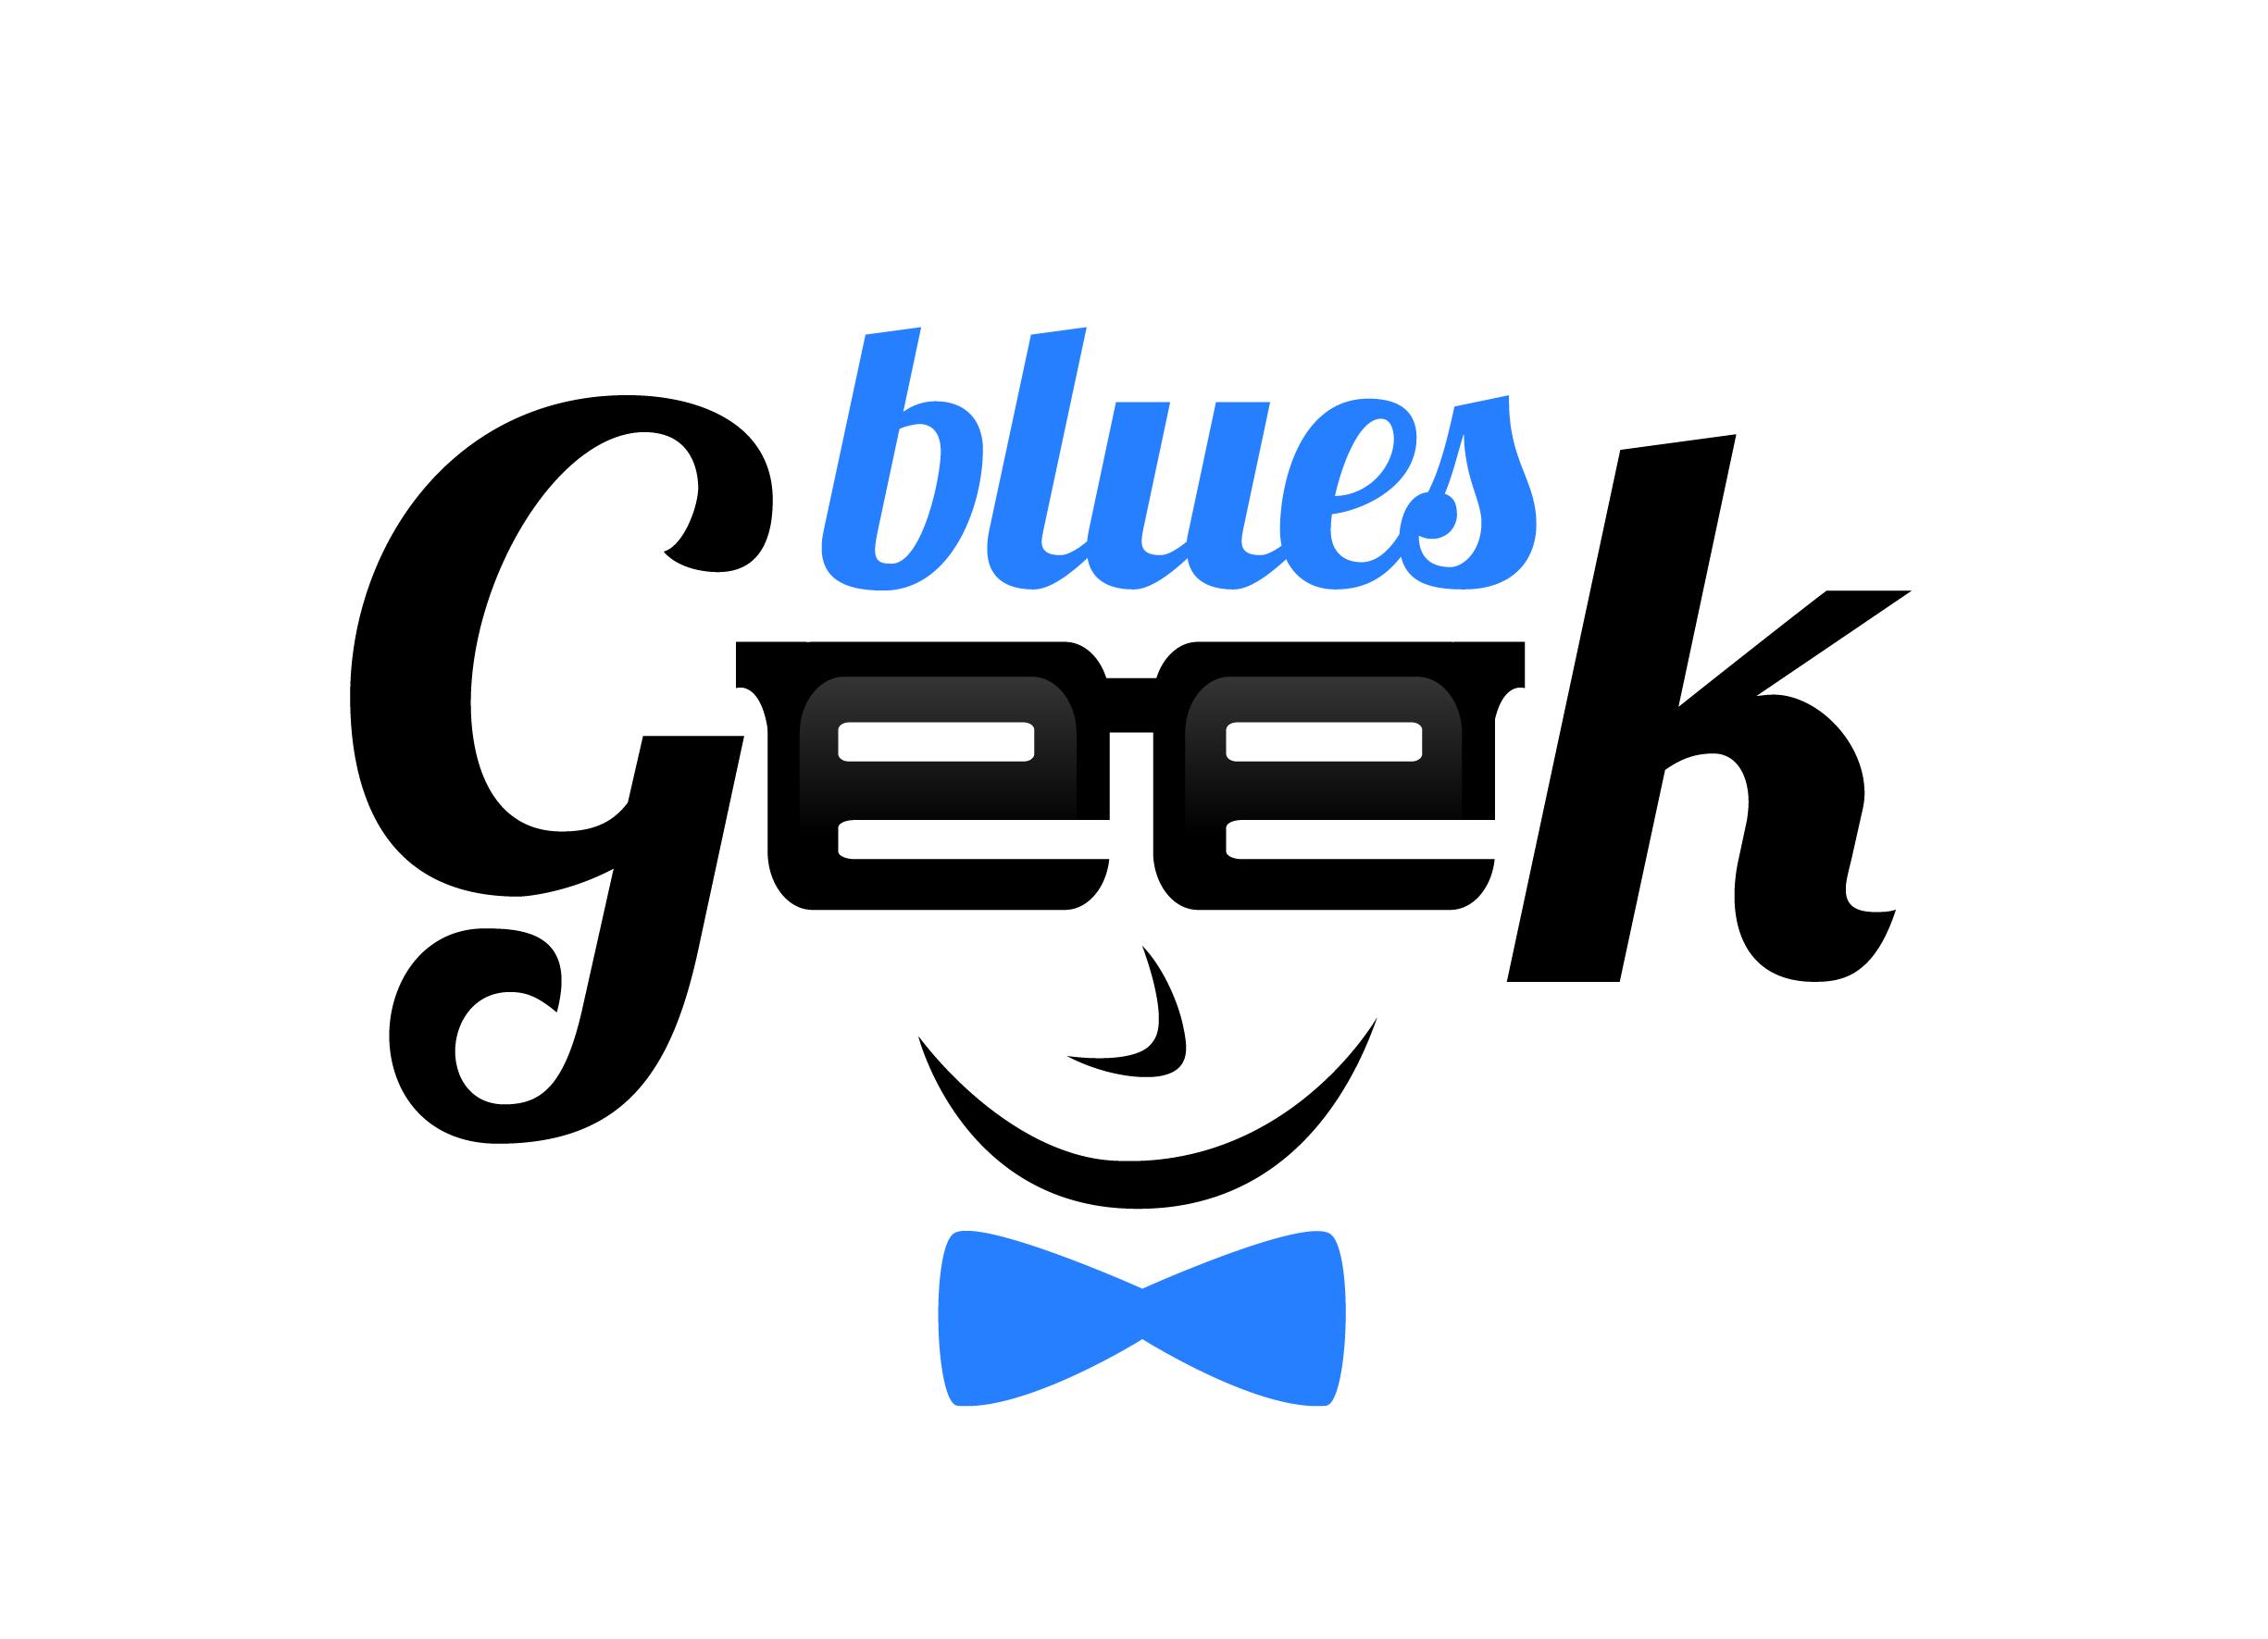 geek logo images reverse search